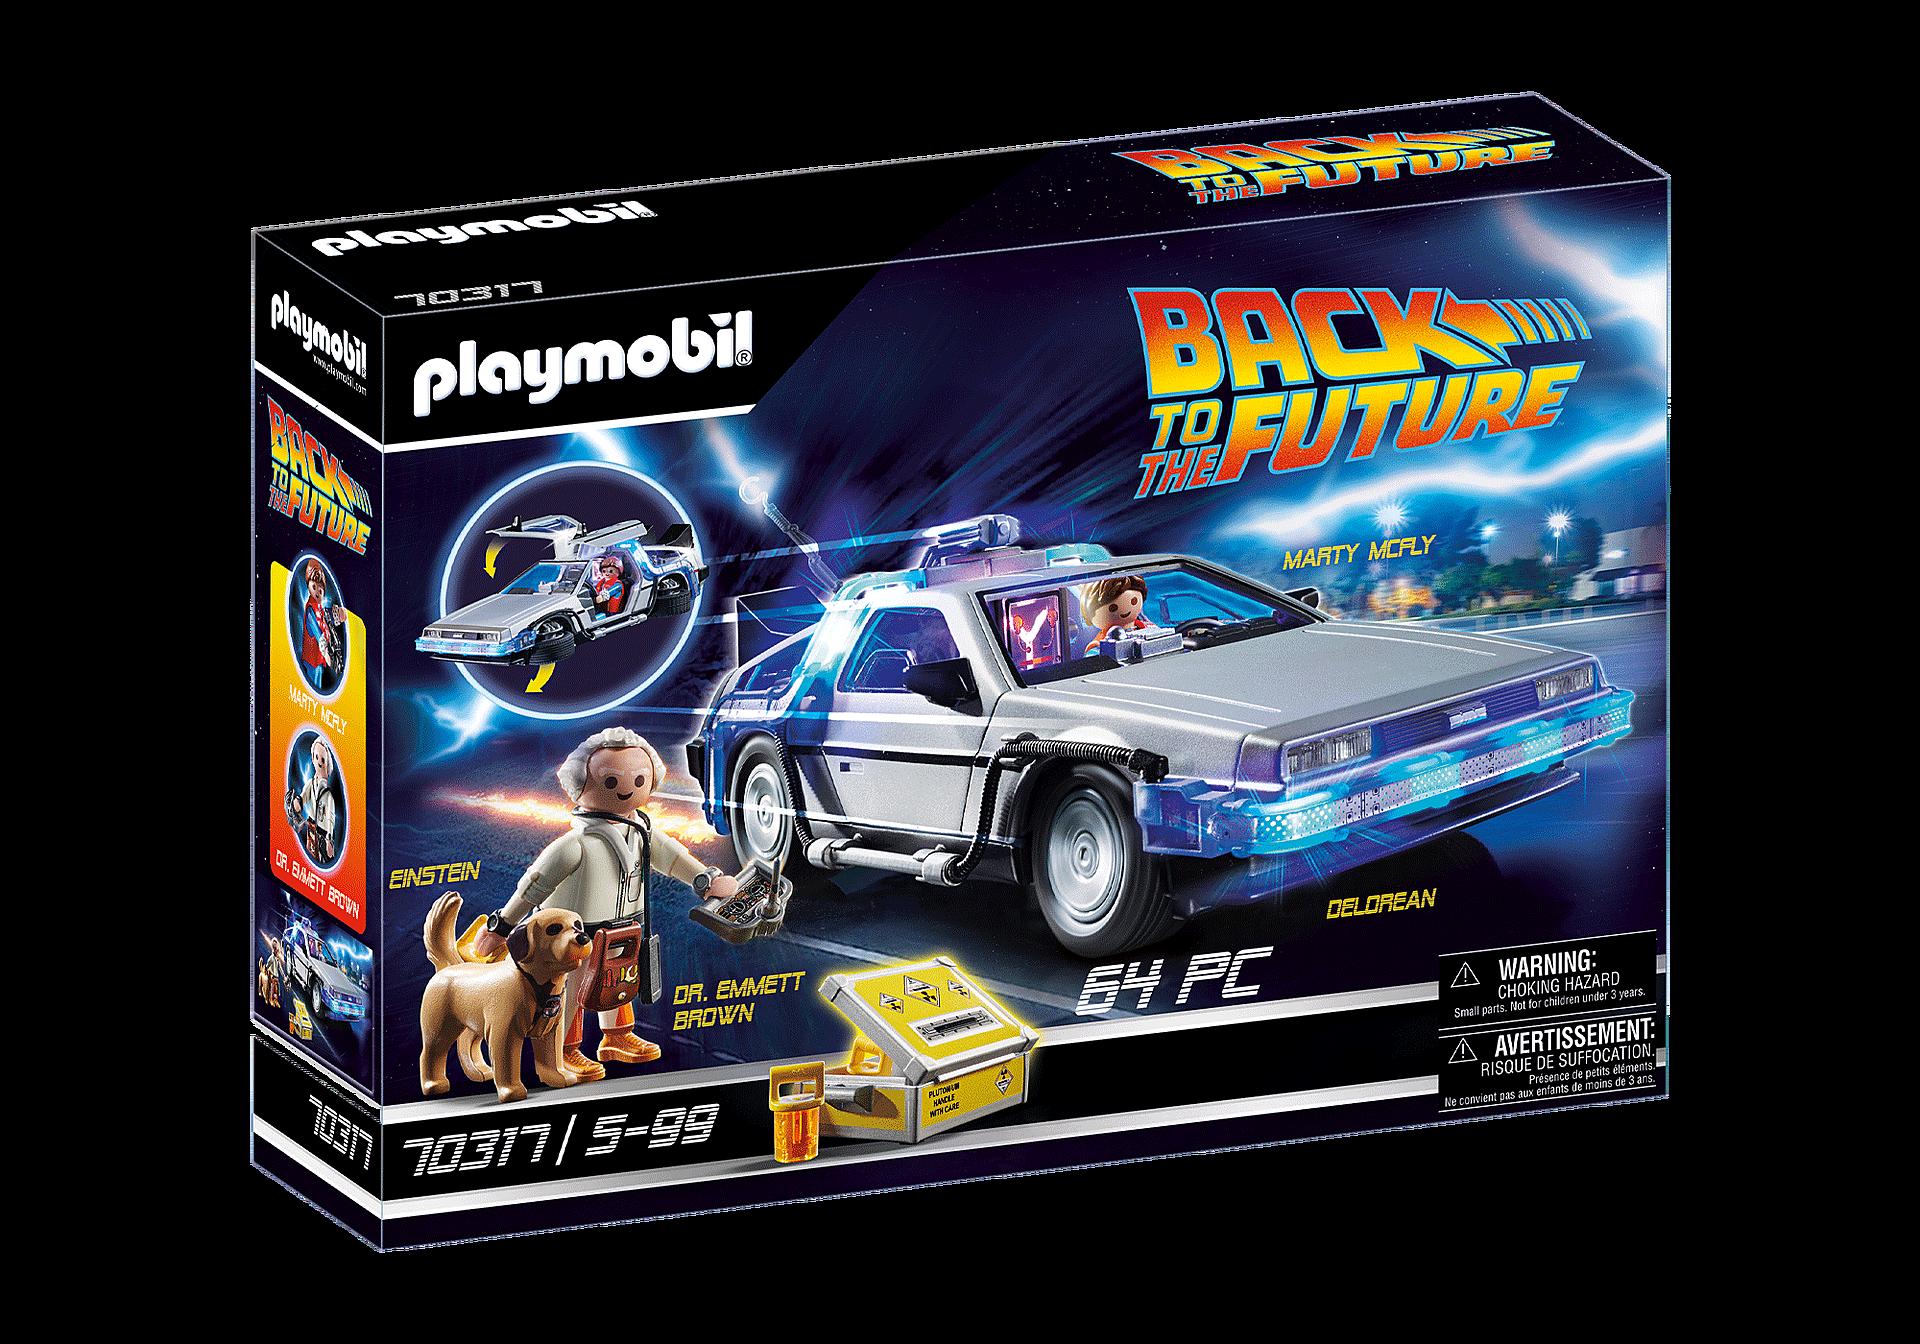 70317 Back to the Future Συλλεκτικό όχημα Ντελόριαν zoom image2